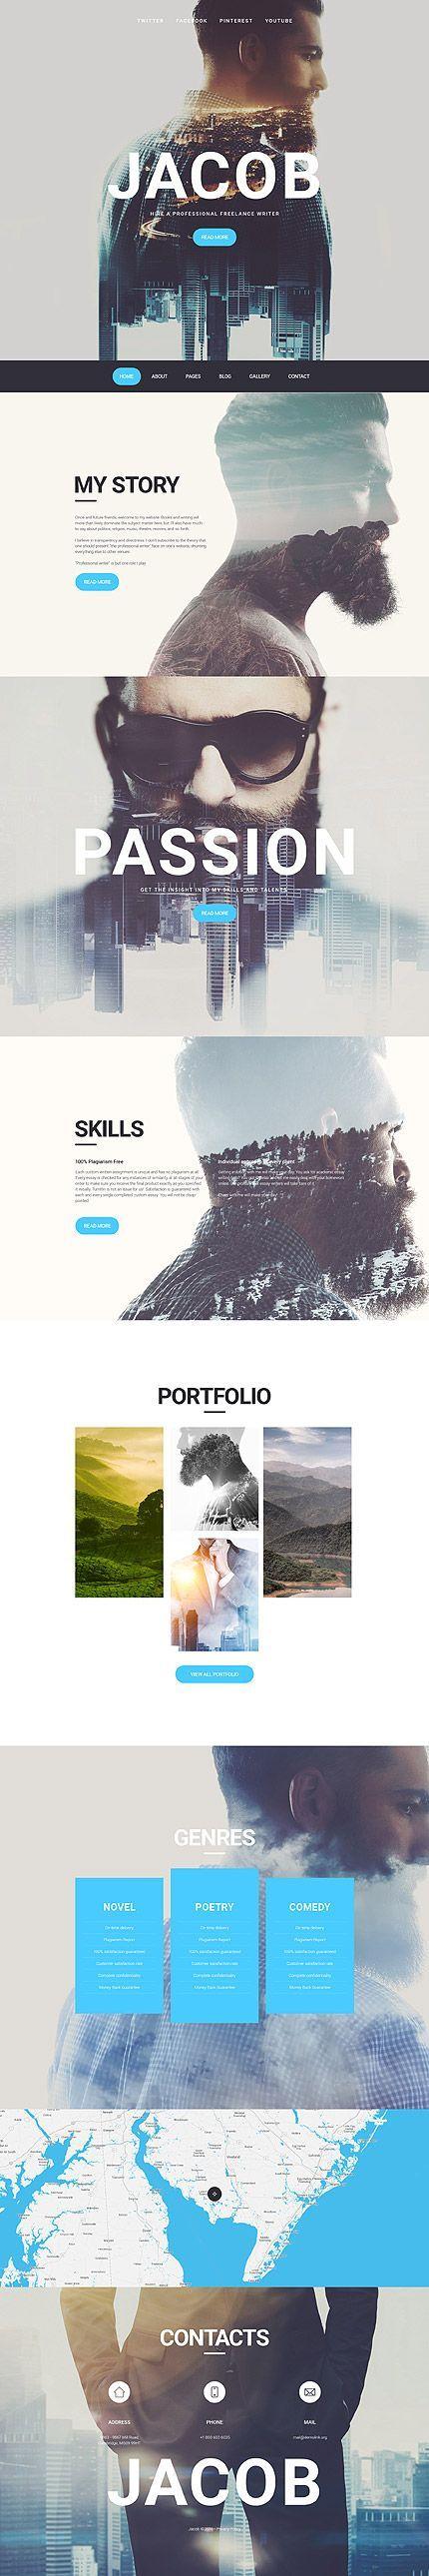 diseño web. diseño web inspiracion, diseño web minimalista, diseño web grafico